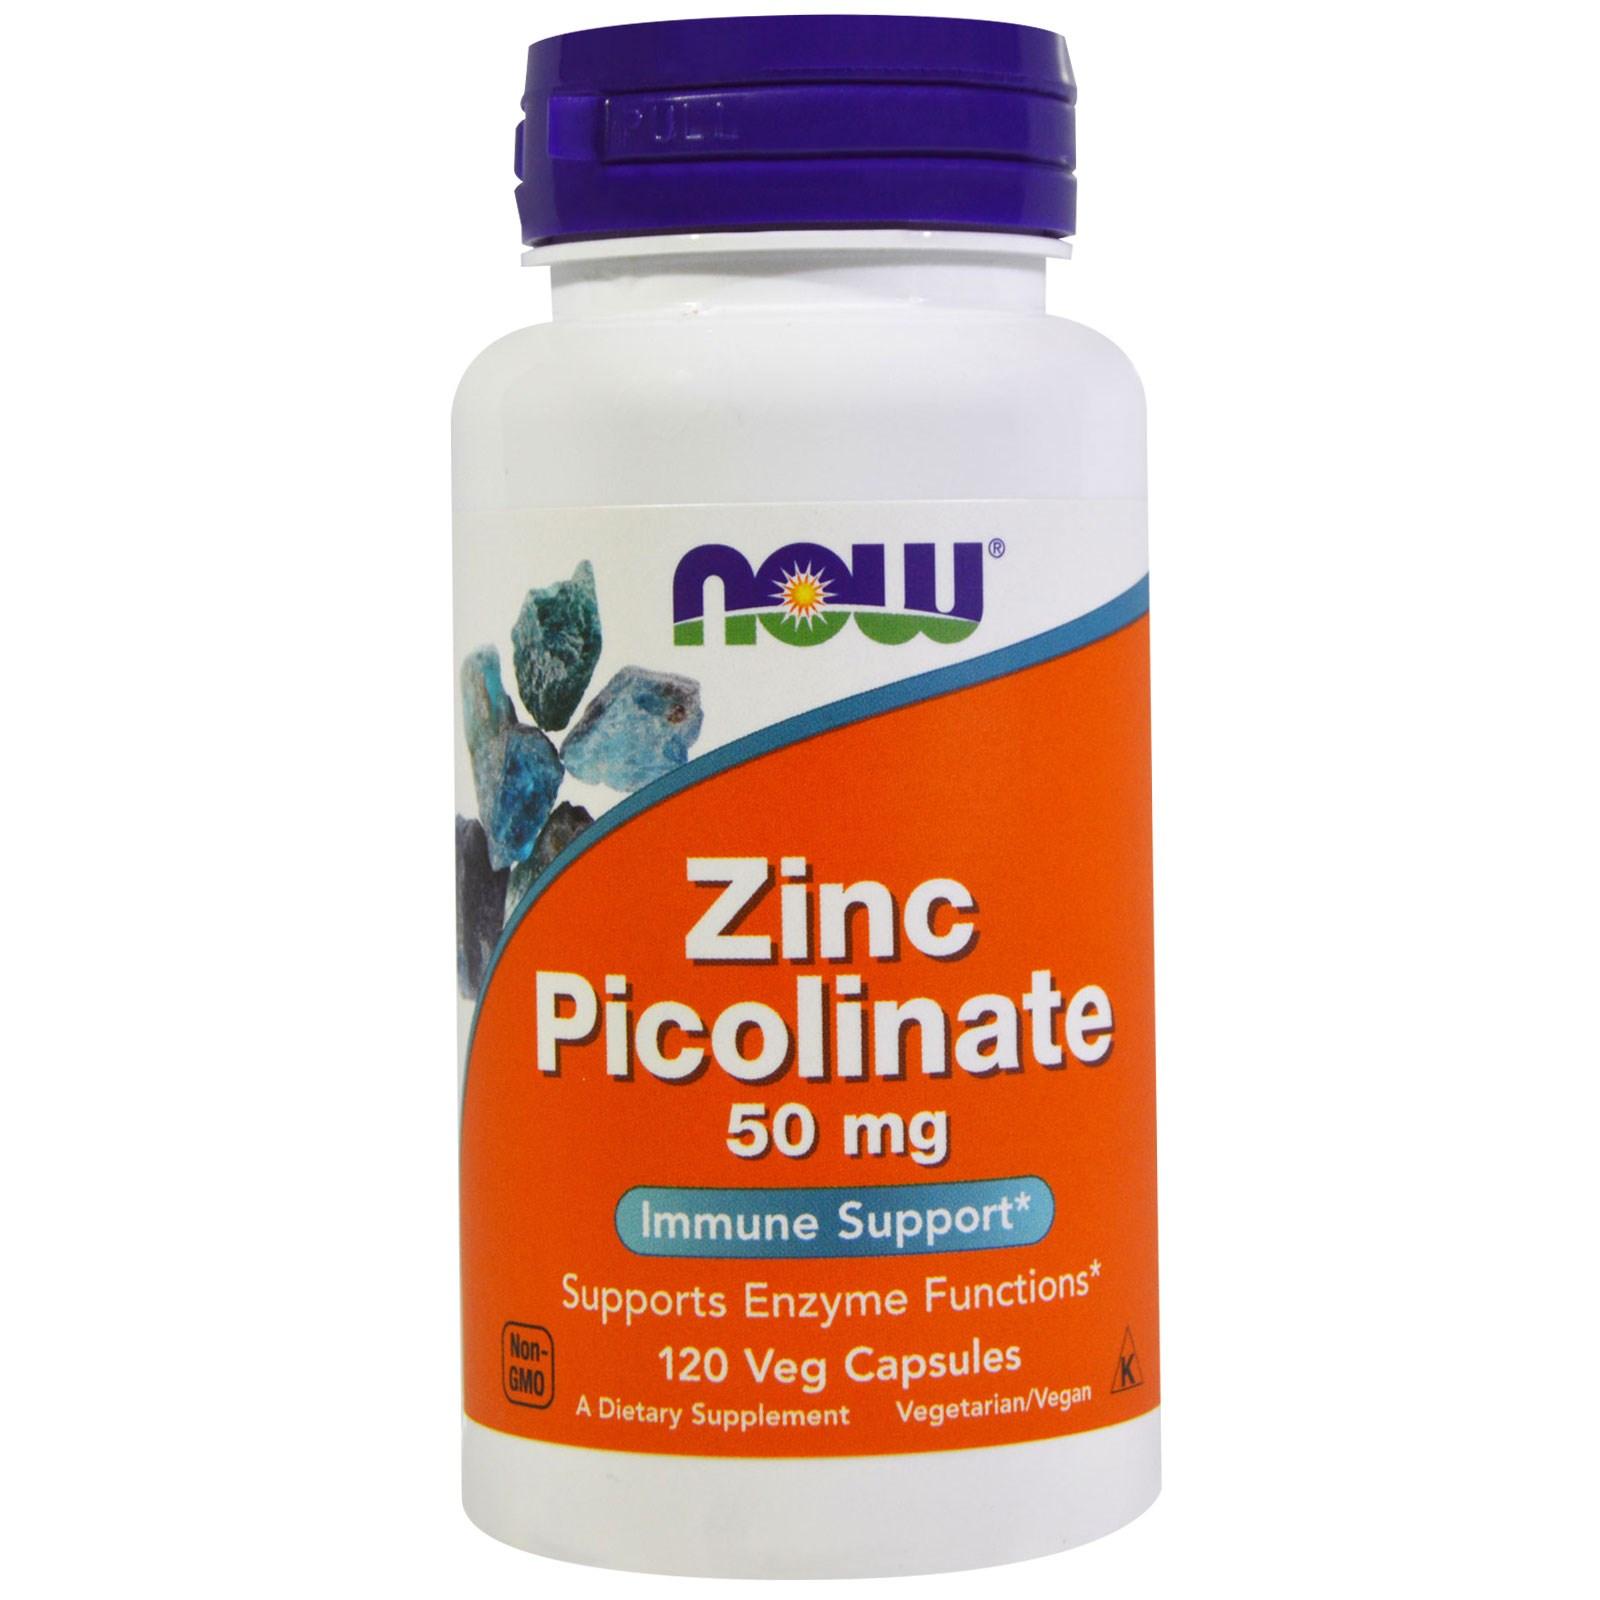 Image of Zinc Picolinate 50 mg (120 Veggie Capsules) - Now Foods 0733739015525